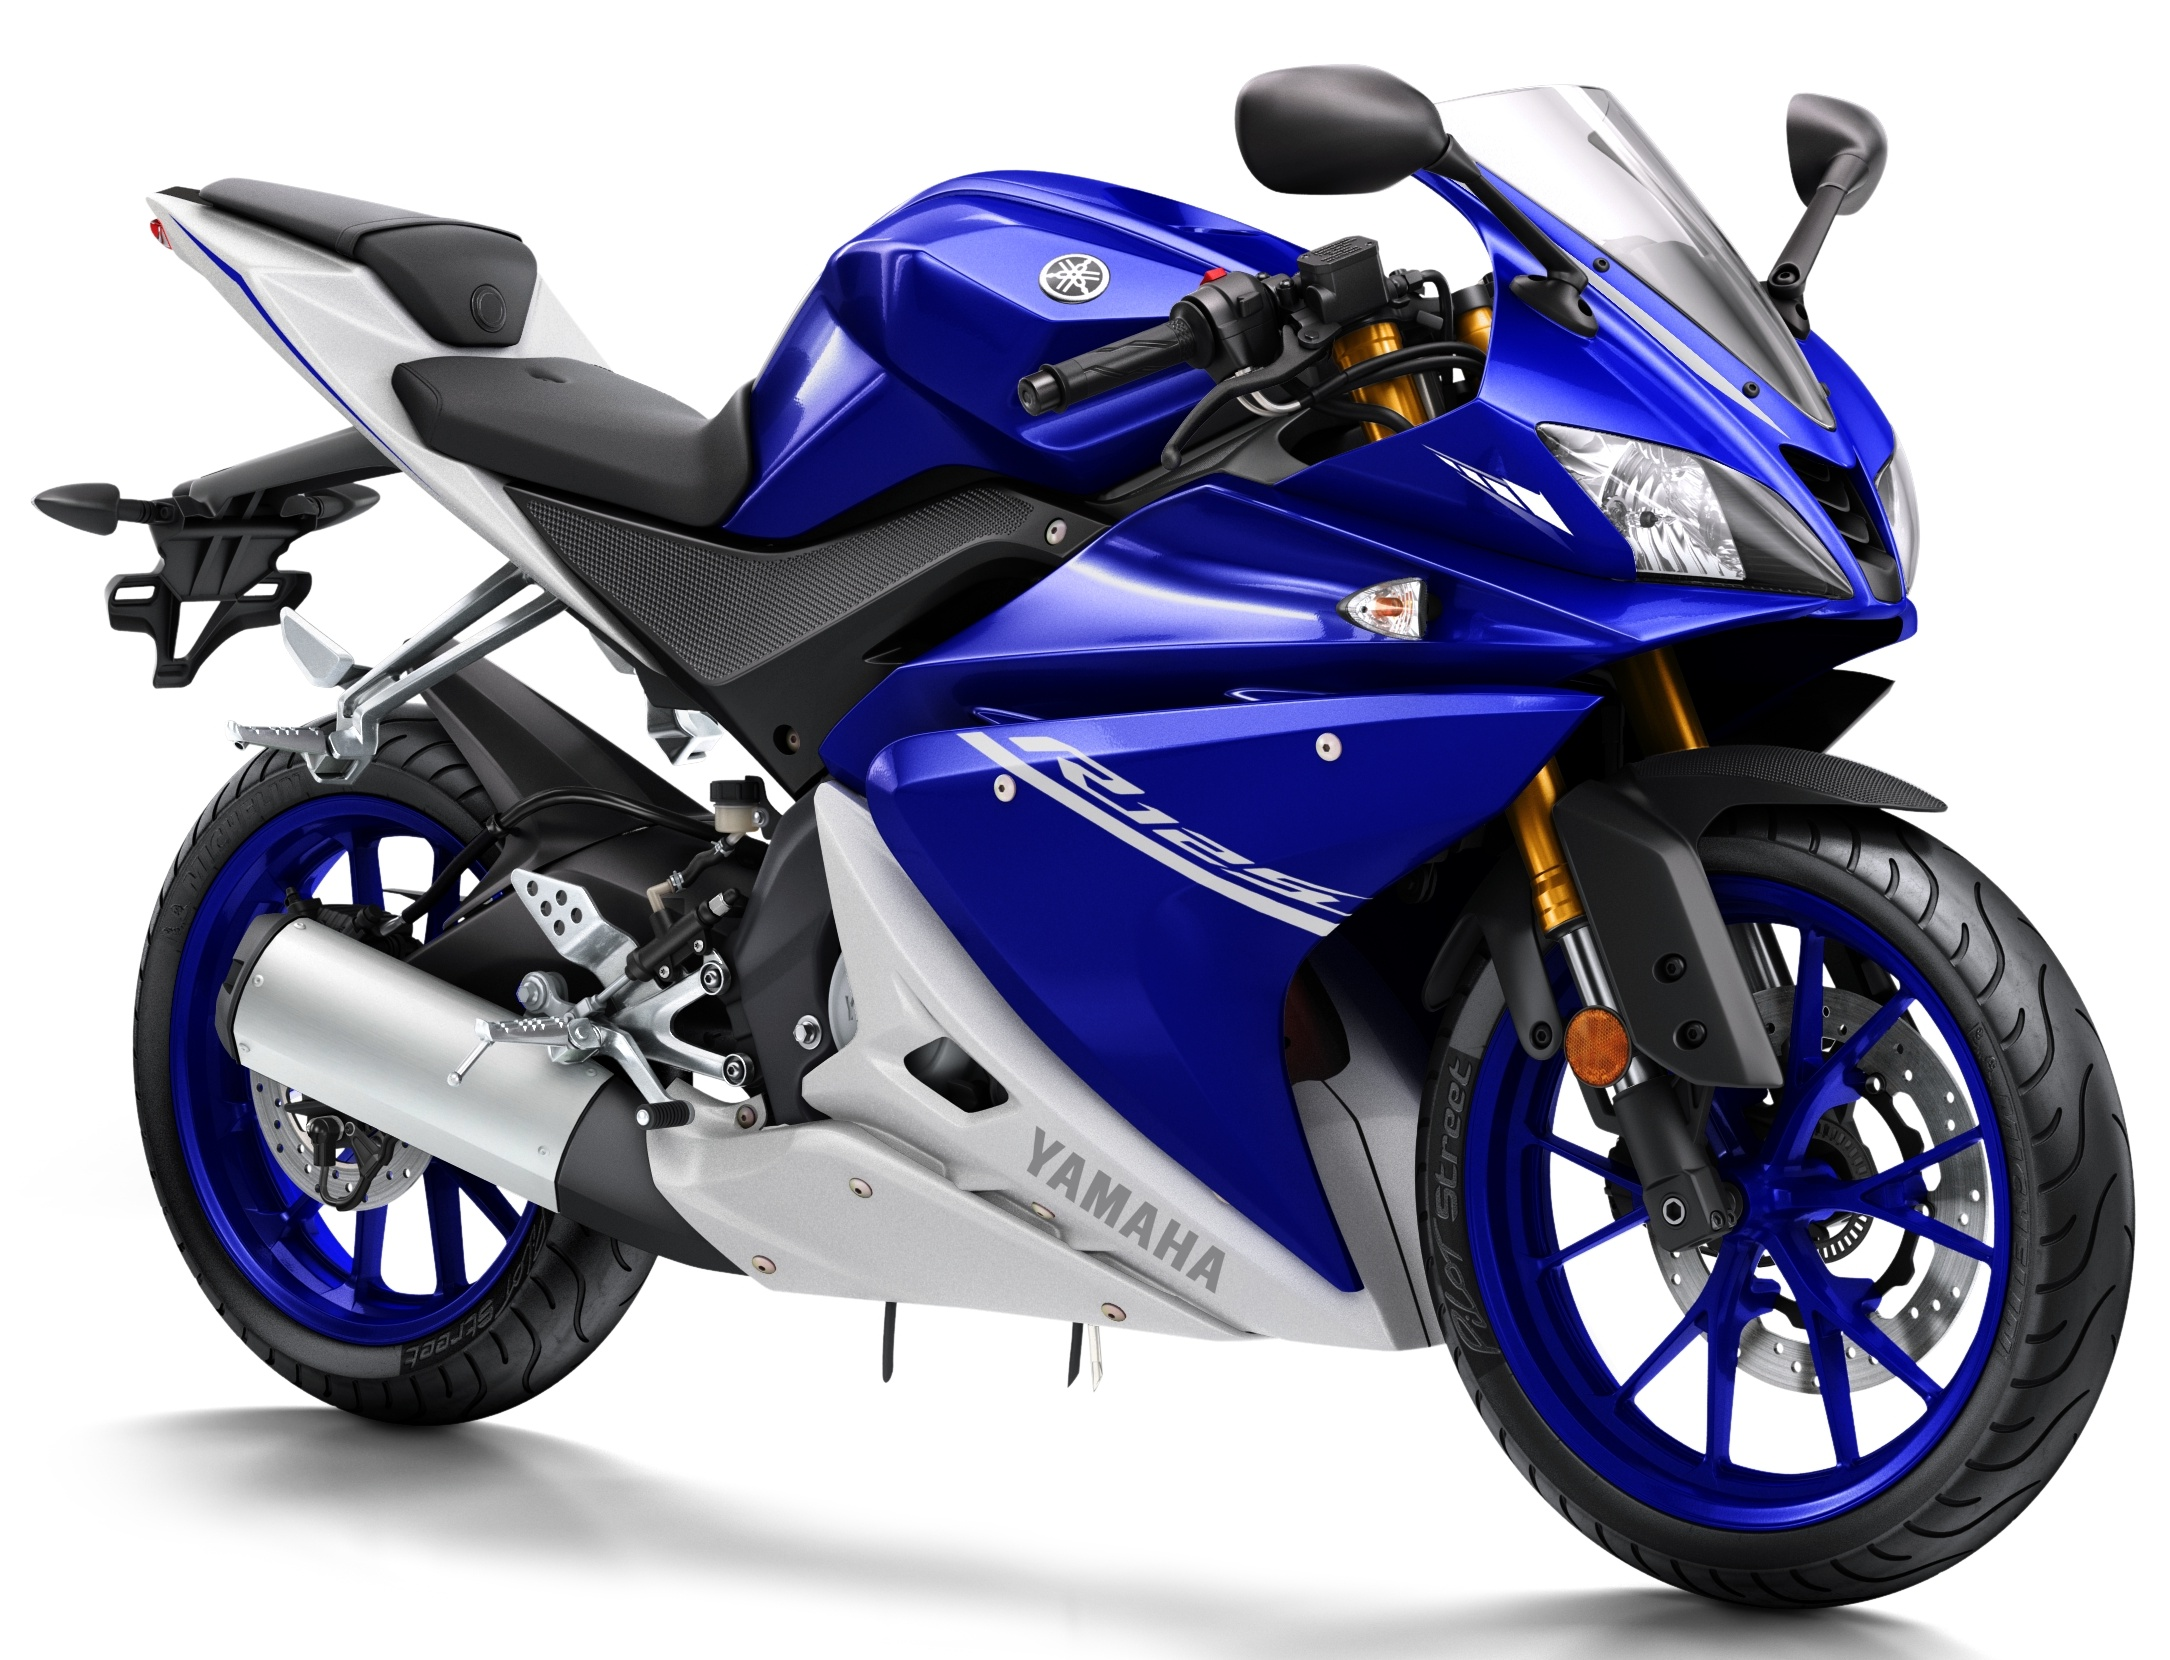 2017 yamaha motorcycles get new colour schemes image 556063. Black Bedroom Furniture Sets. Home Design Ideas